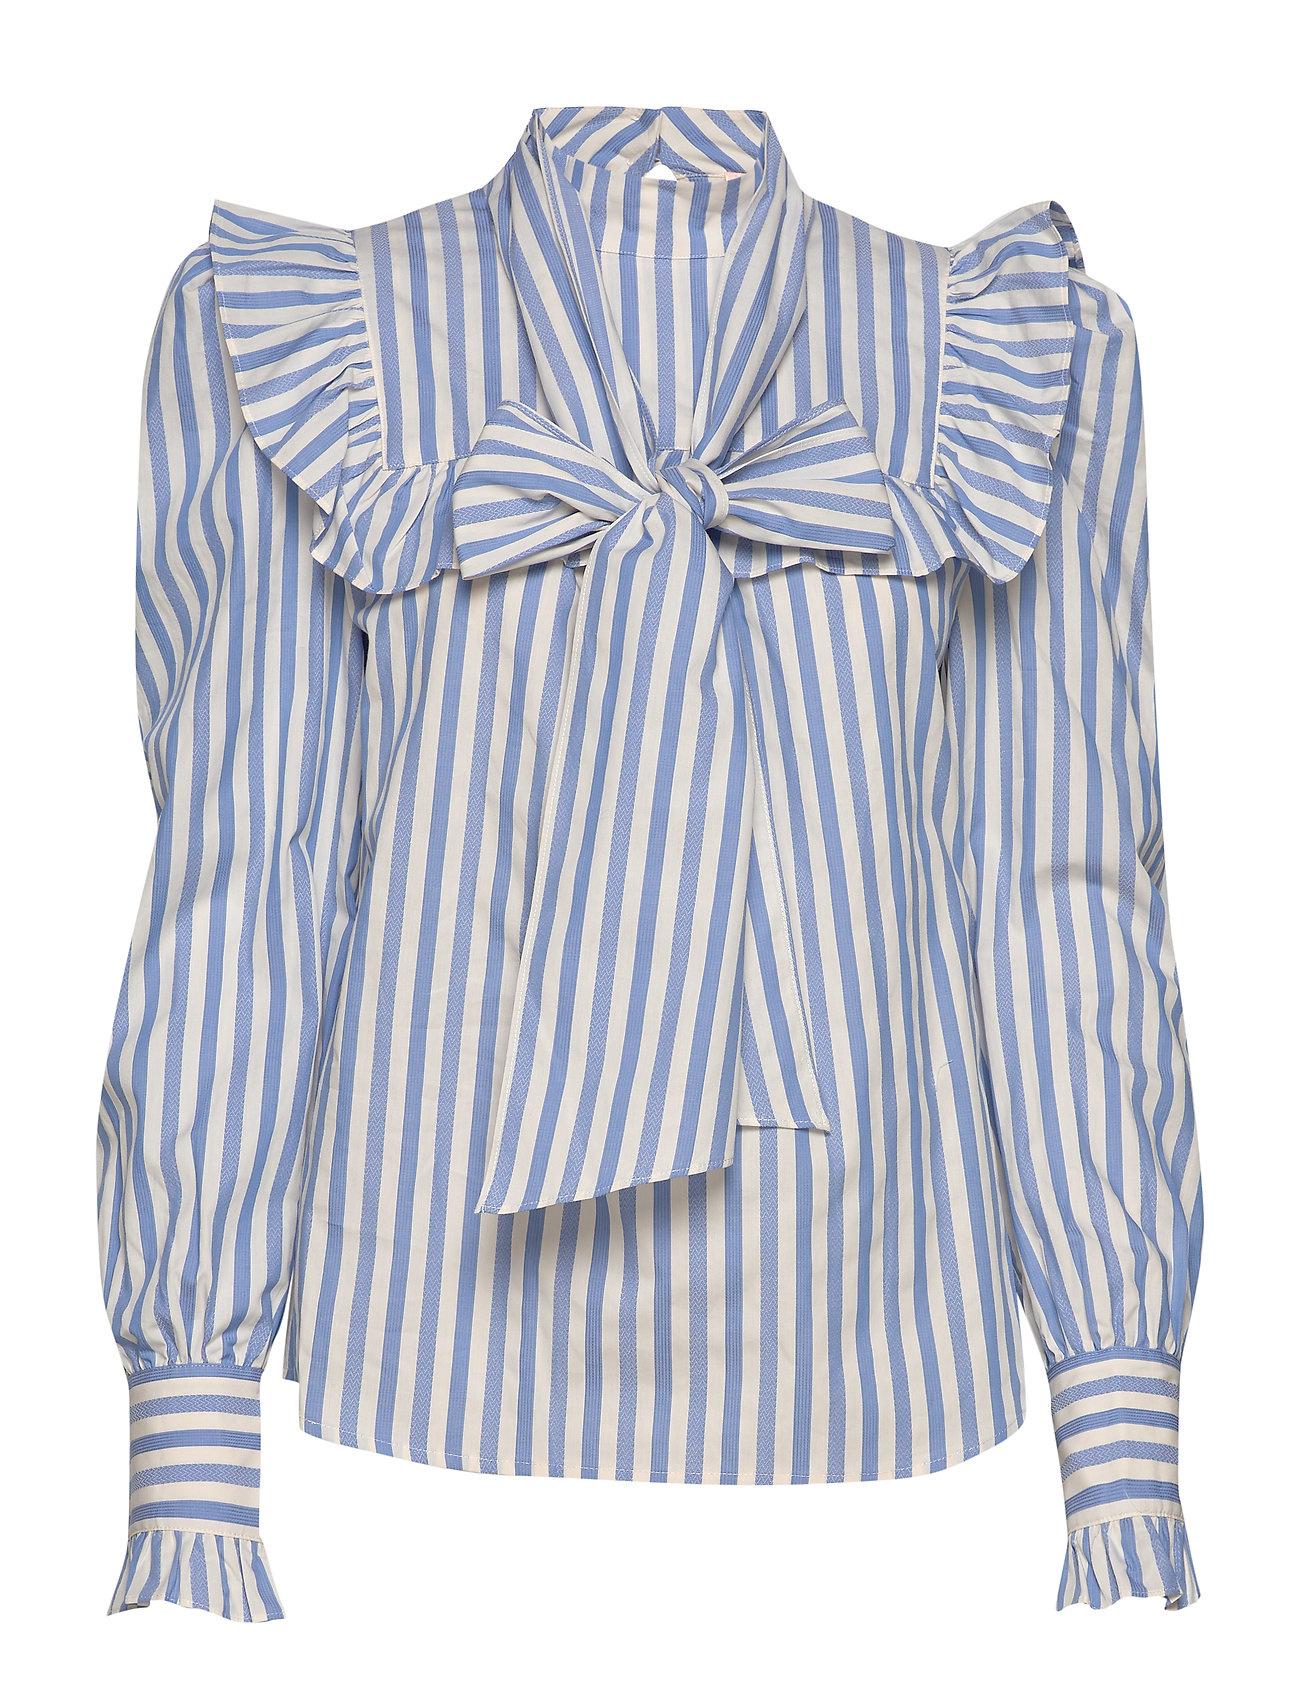 Custommade gestreept  blouse, blauw